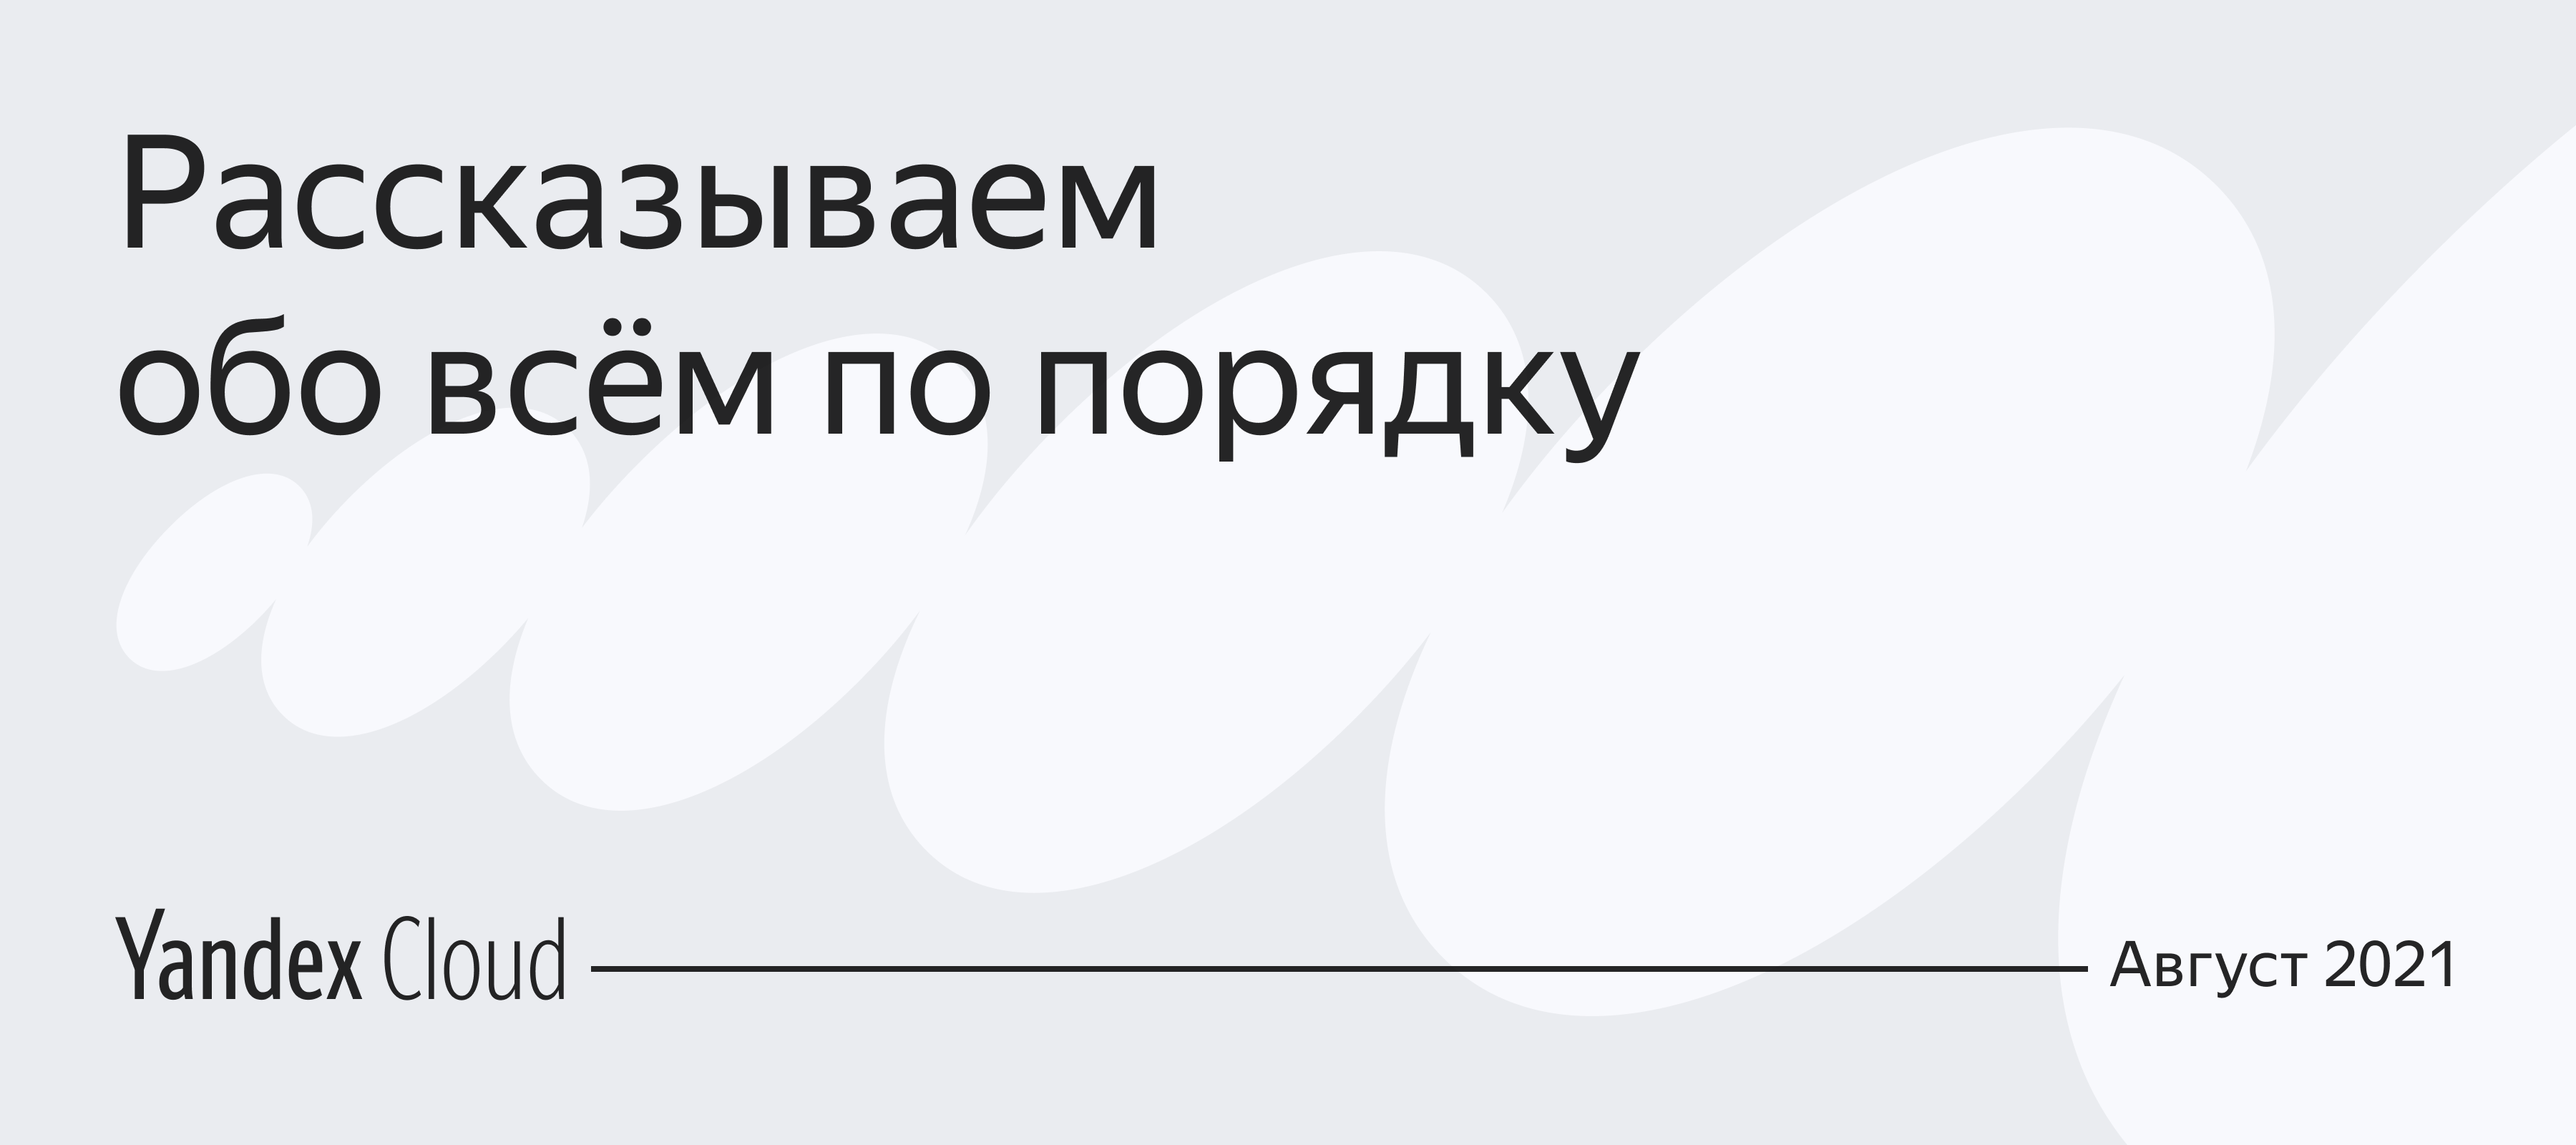 Yandex.Cloud news digest August 2021